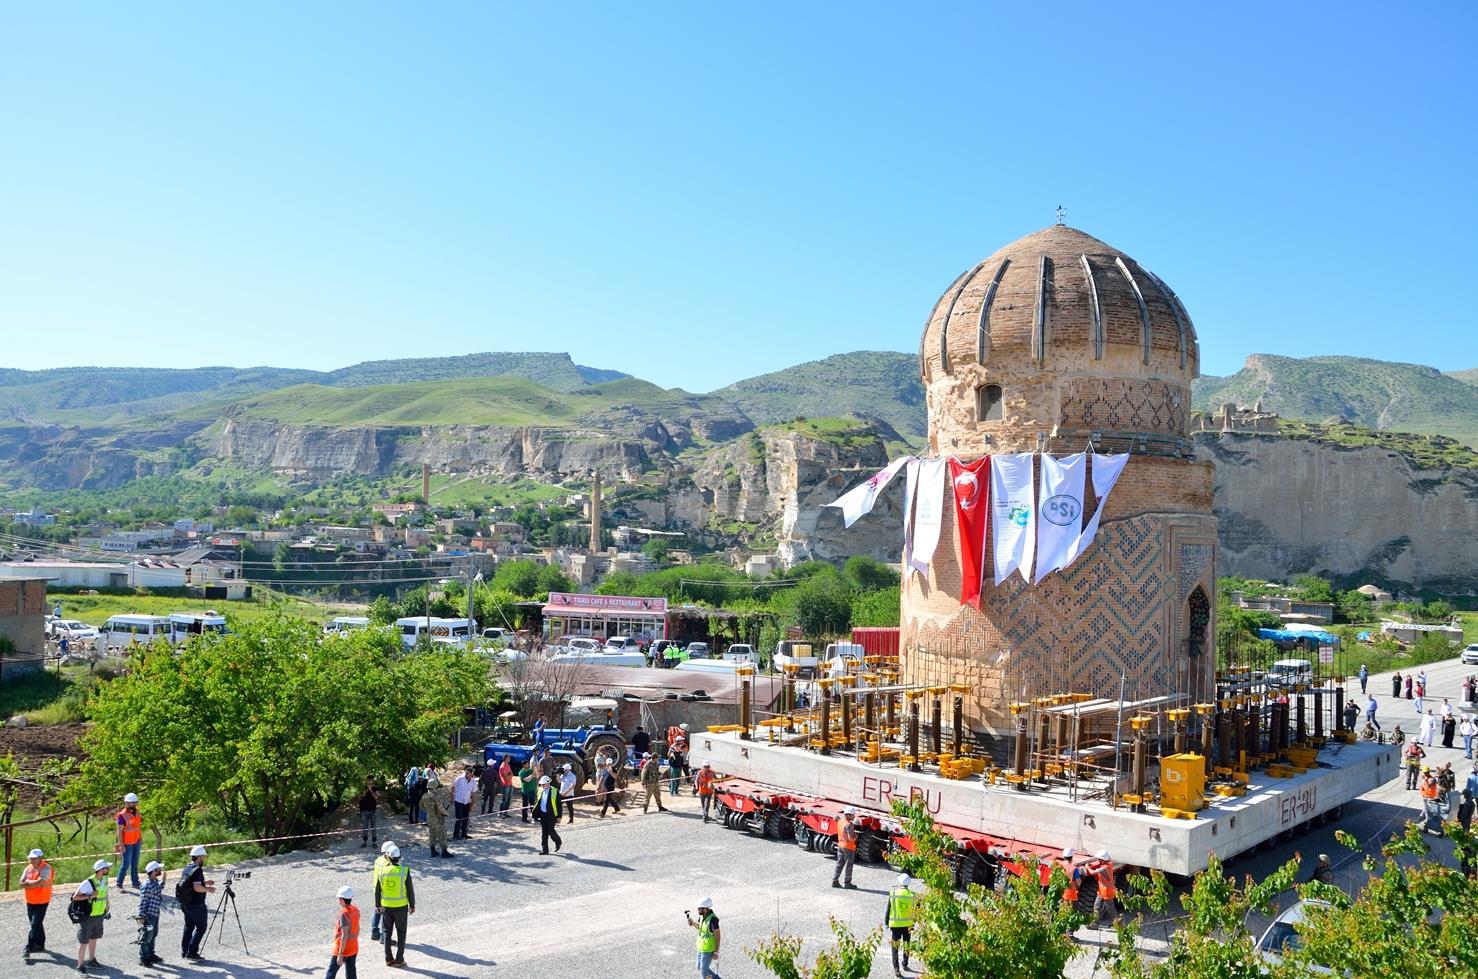 Çaba Heavy Lift & Haulage last year relocated the 1,100-tonne Zeynel Bey Tomb in Hasankeyf, Turkey.